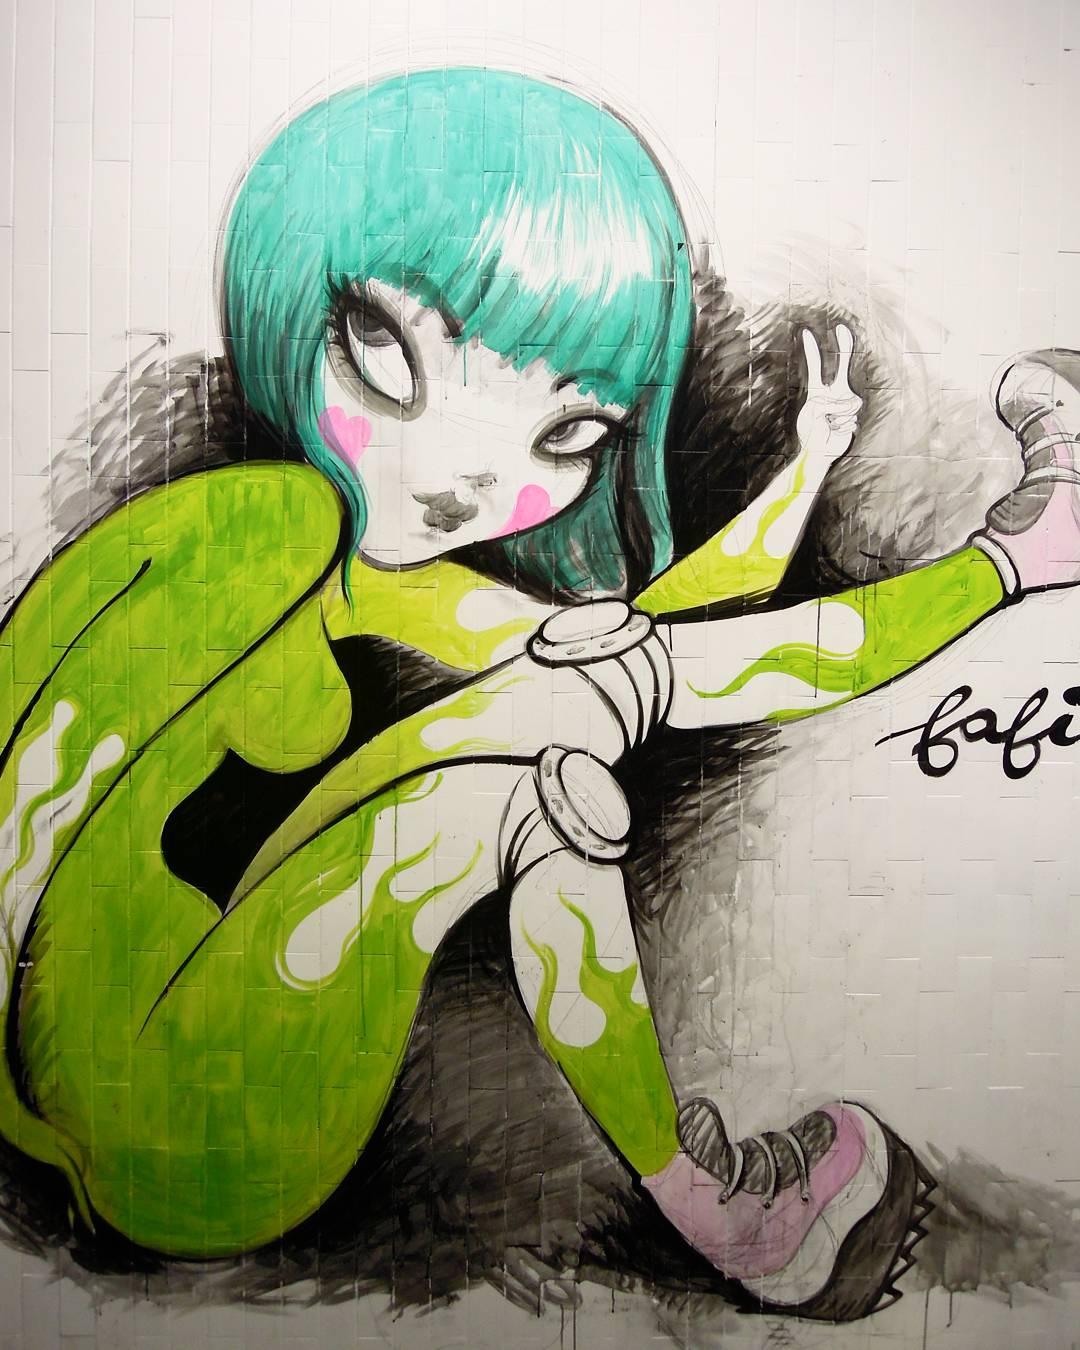 art by Fafi, street art, art urbain, quai 36, gare u nord , paris, wildstreet